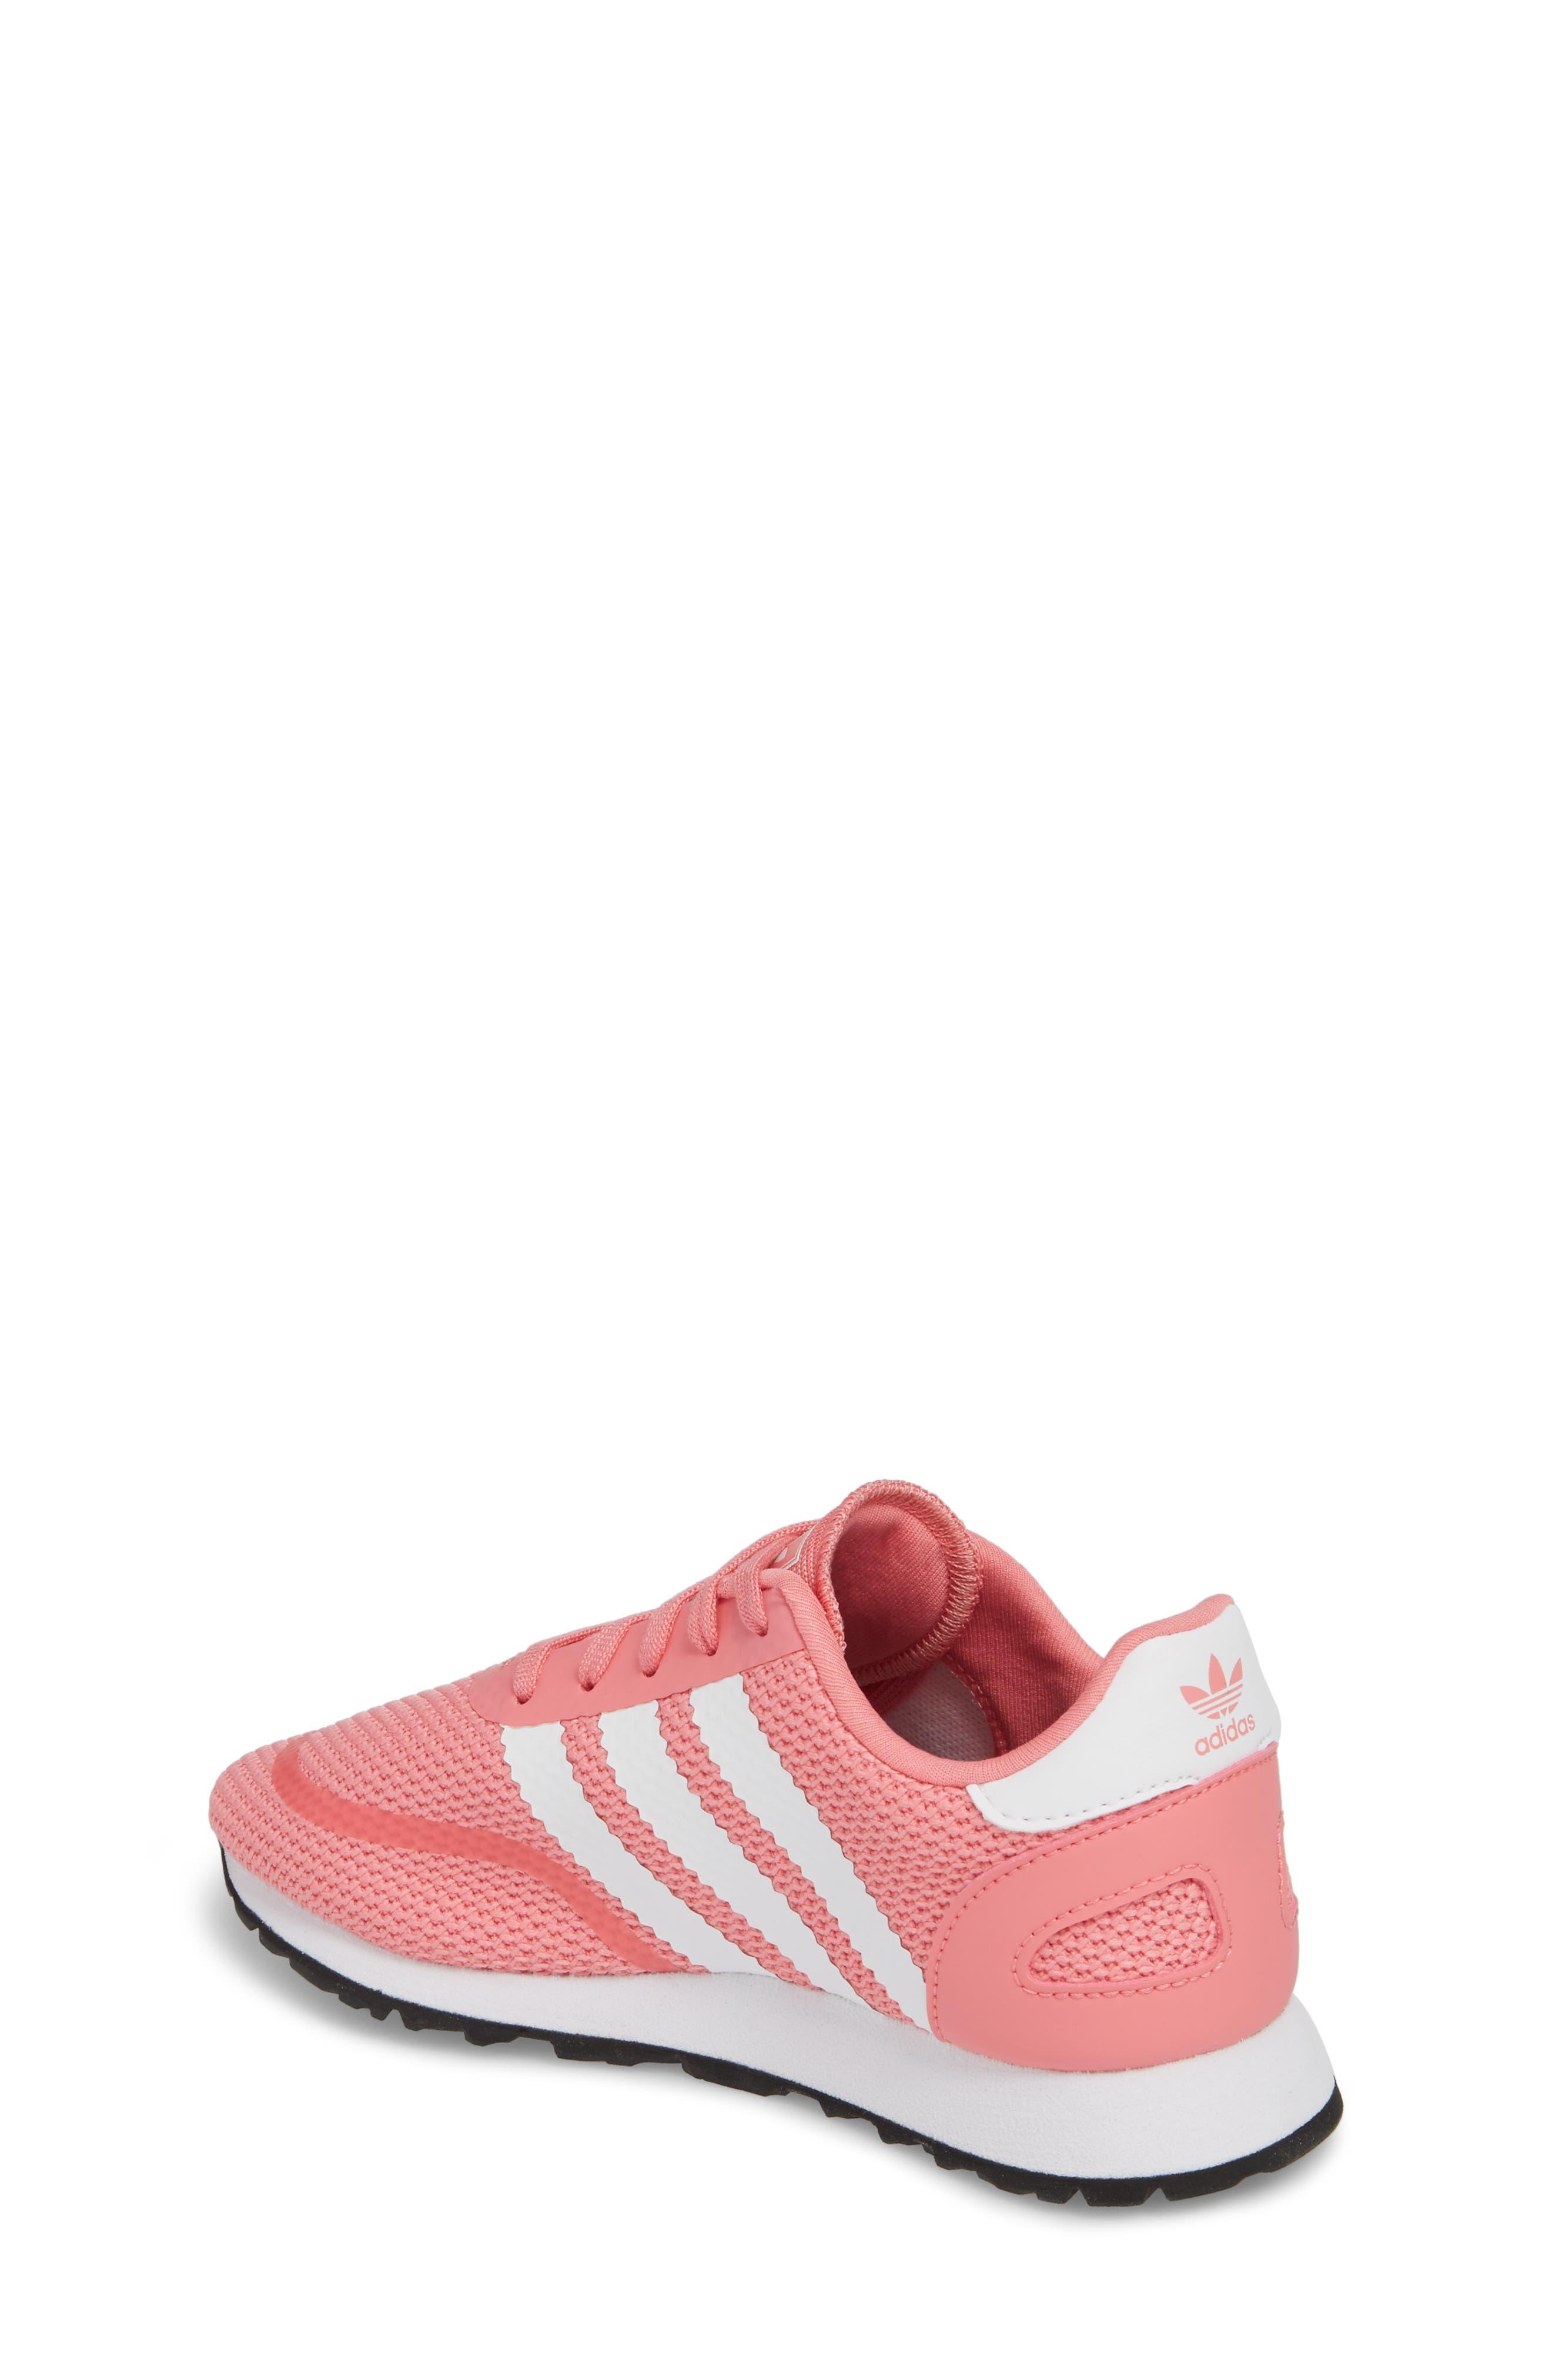 N-5923 Sneaker,                             Alternate thumbnail 2, color,                             Chalk Pink / White / White